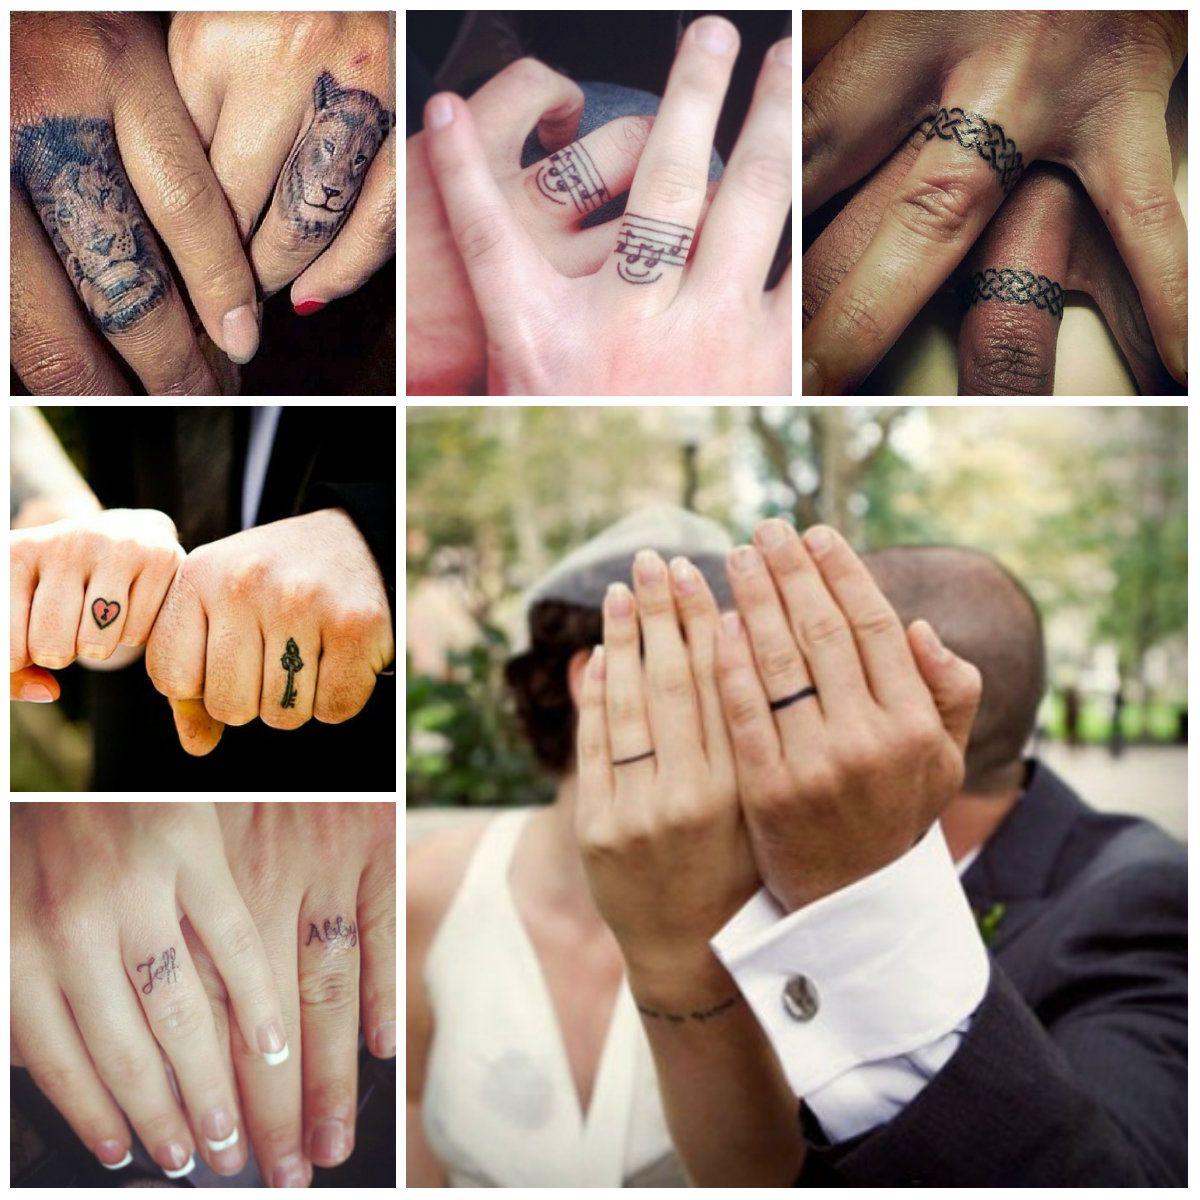 Amazing Wedding Ring Tattoos  Tattoo Ideas Gallery & Designs 2016